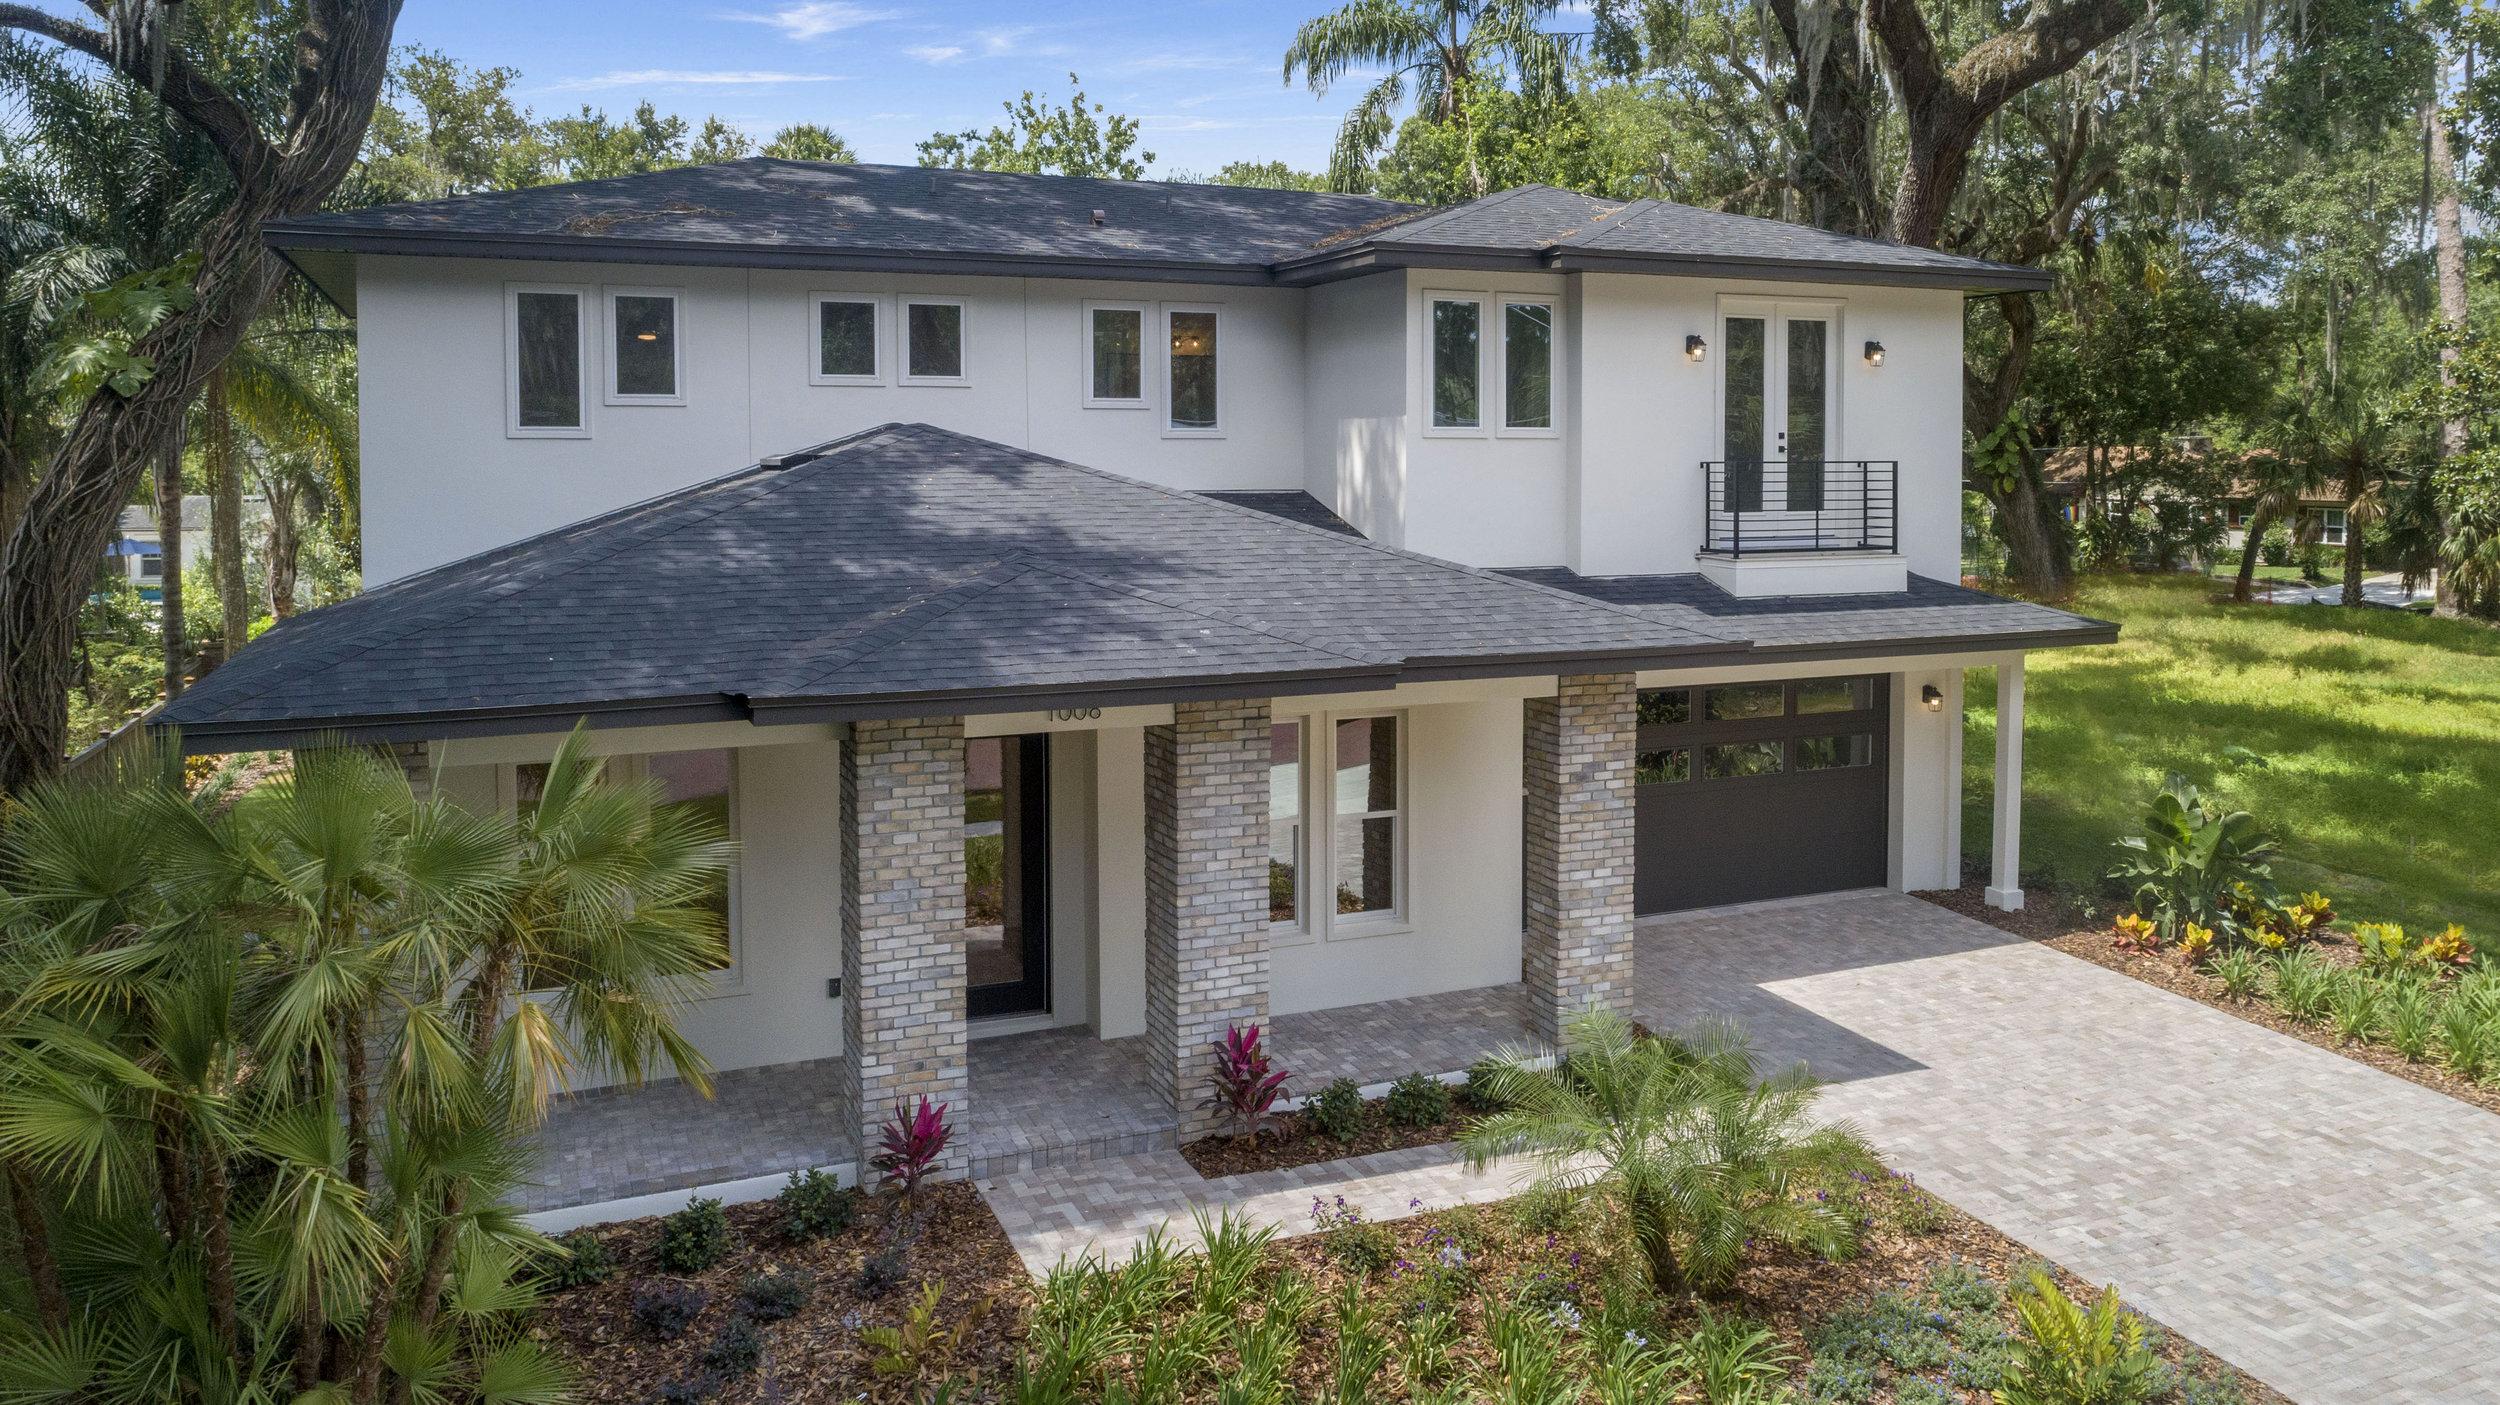 1008 Greenwood St, Orlando_DJI_0943.jpg